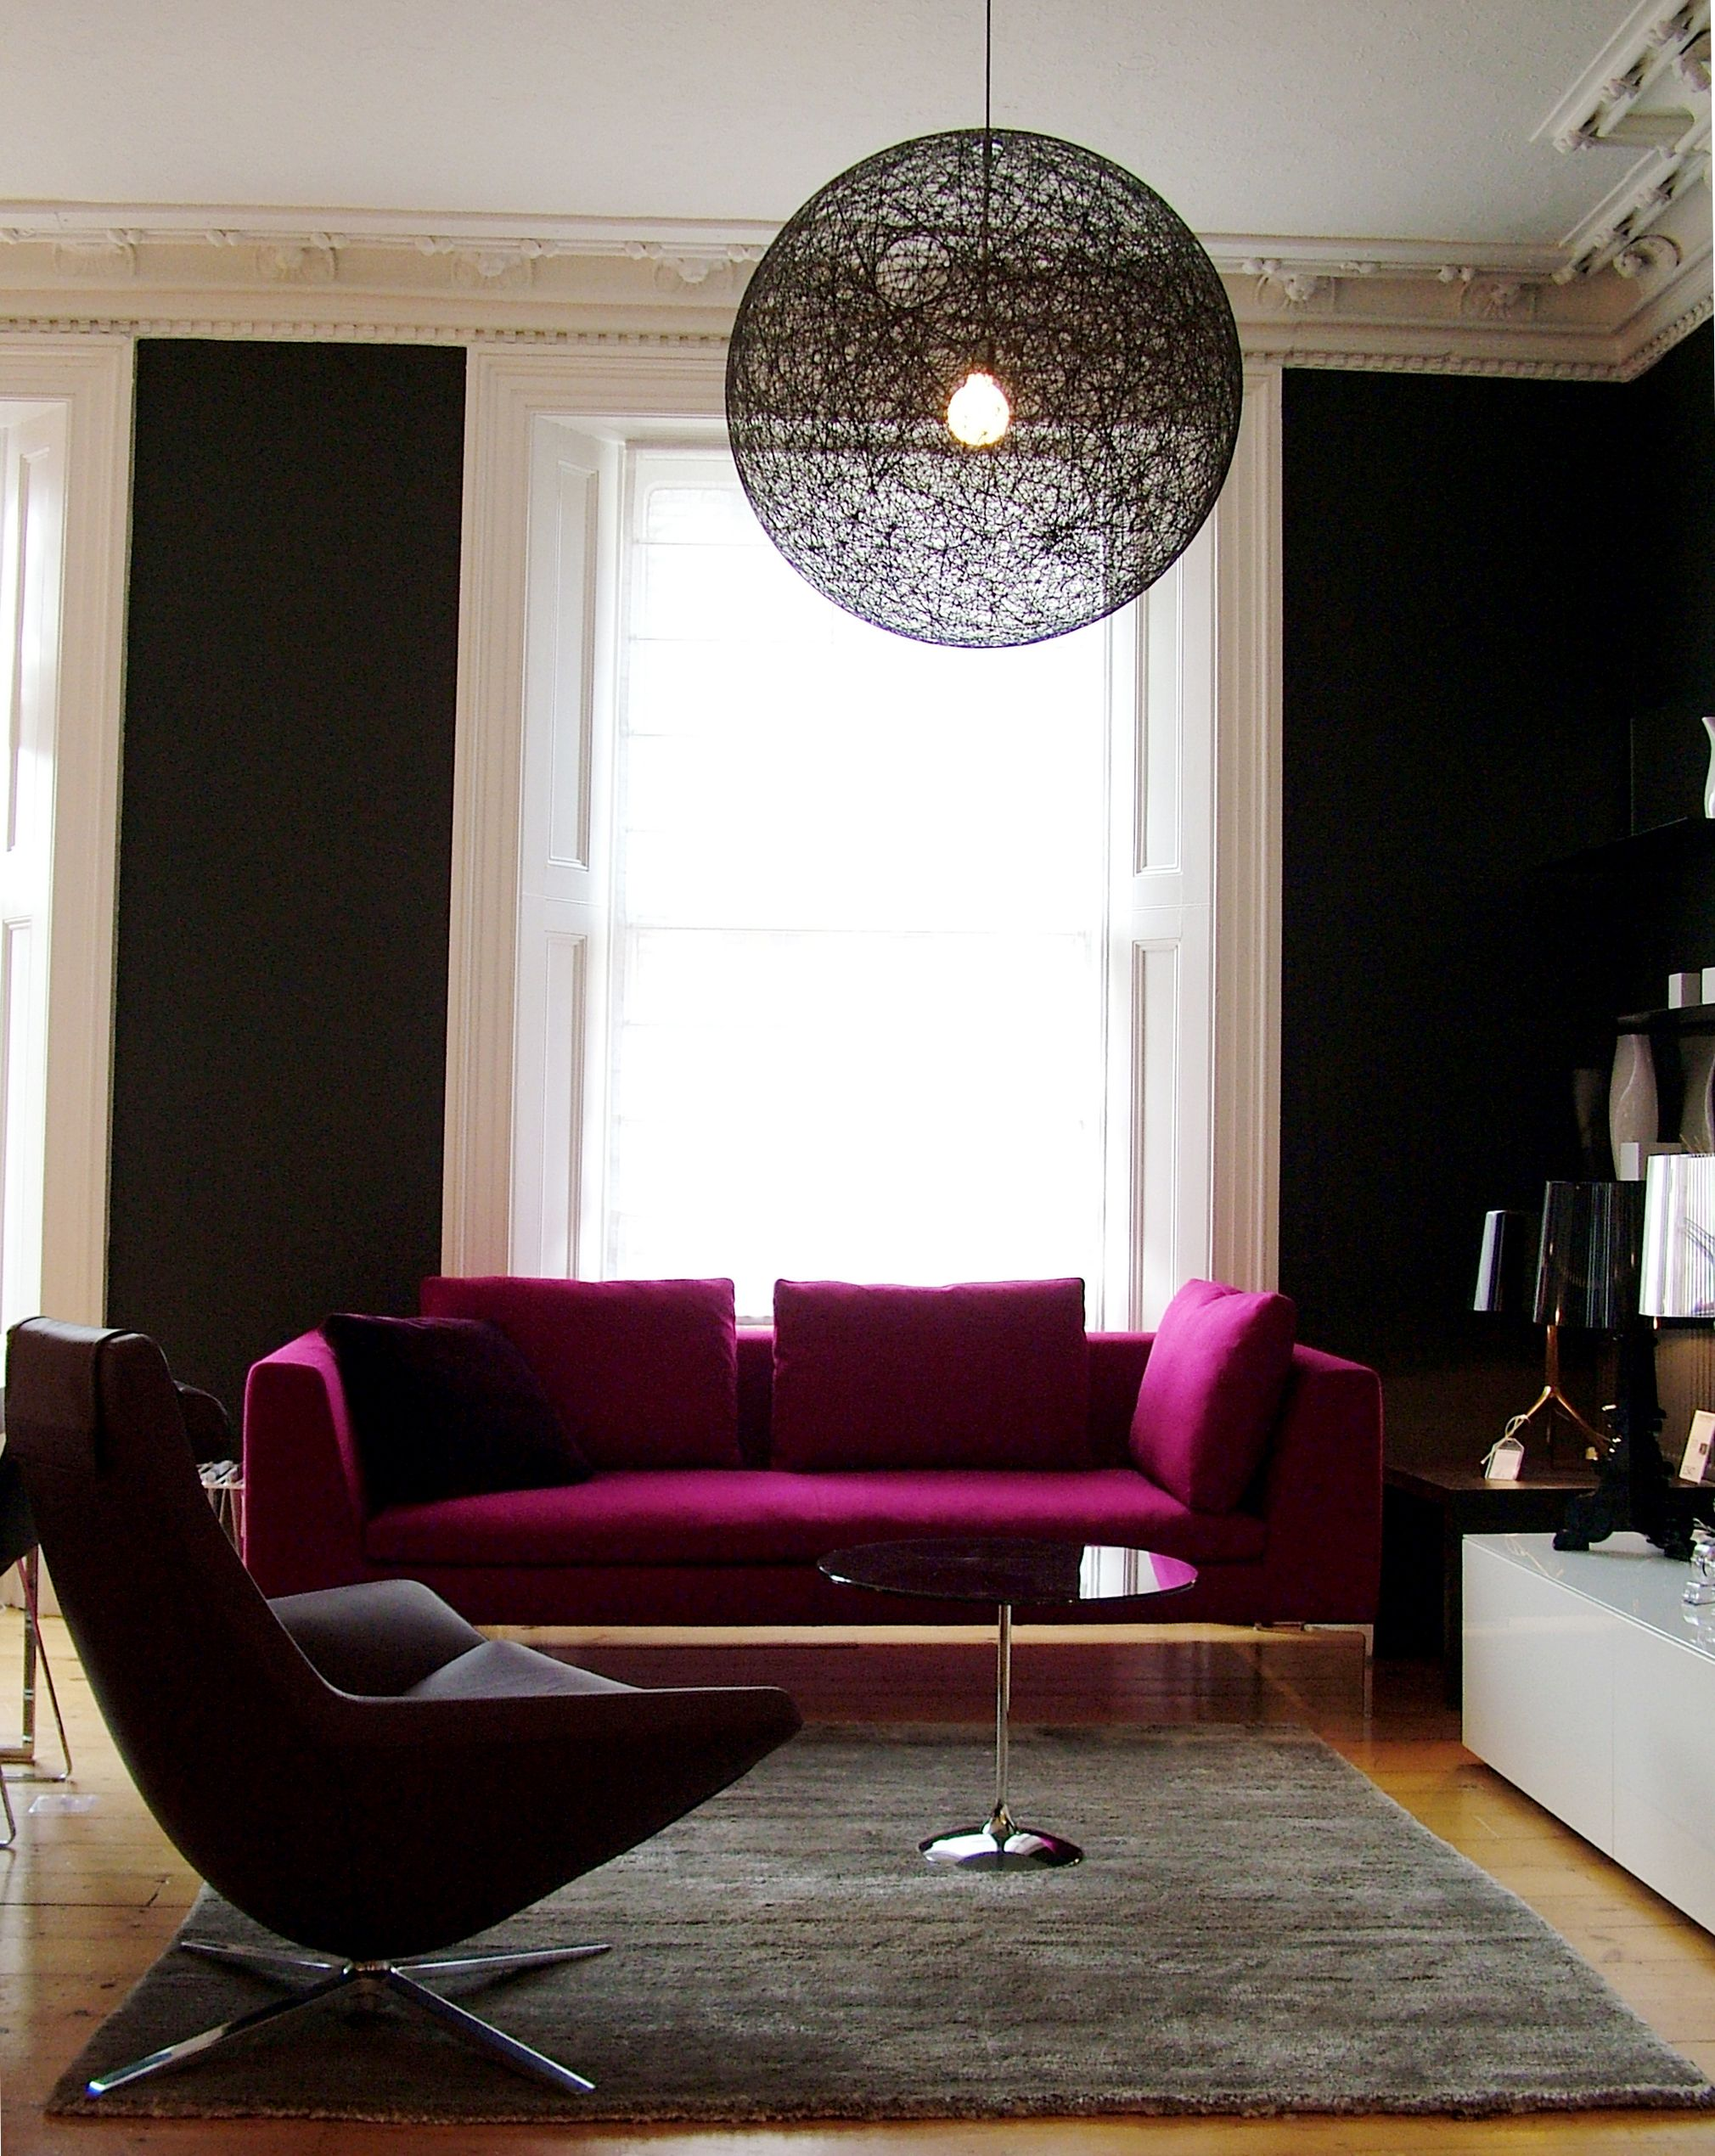 black walls, fuchsia pink sofa | INSPIRING INTERIORS | Pinterest ...